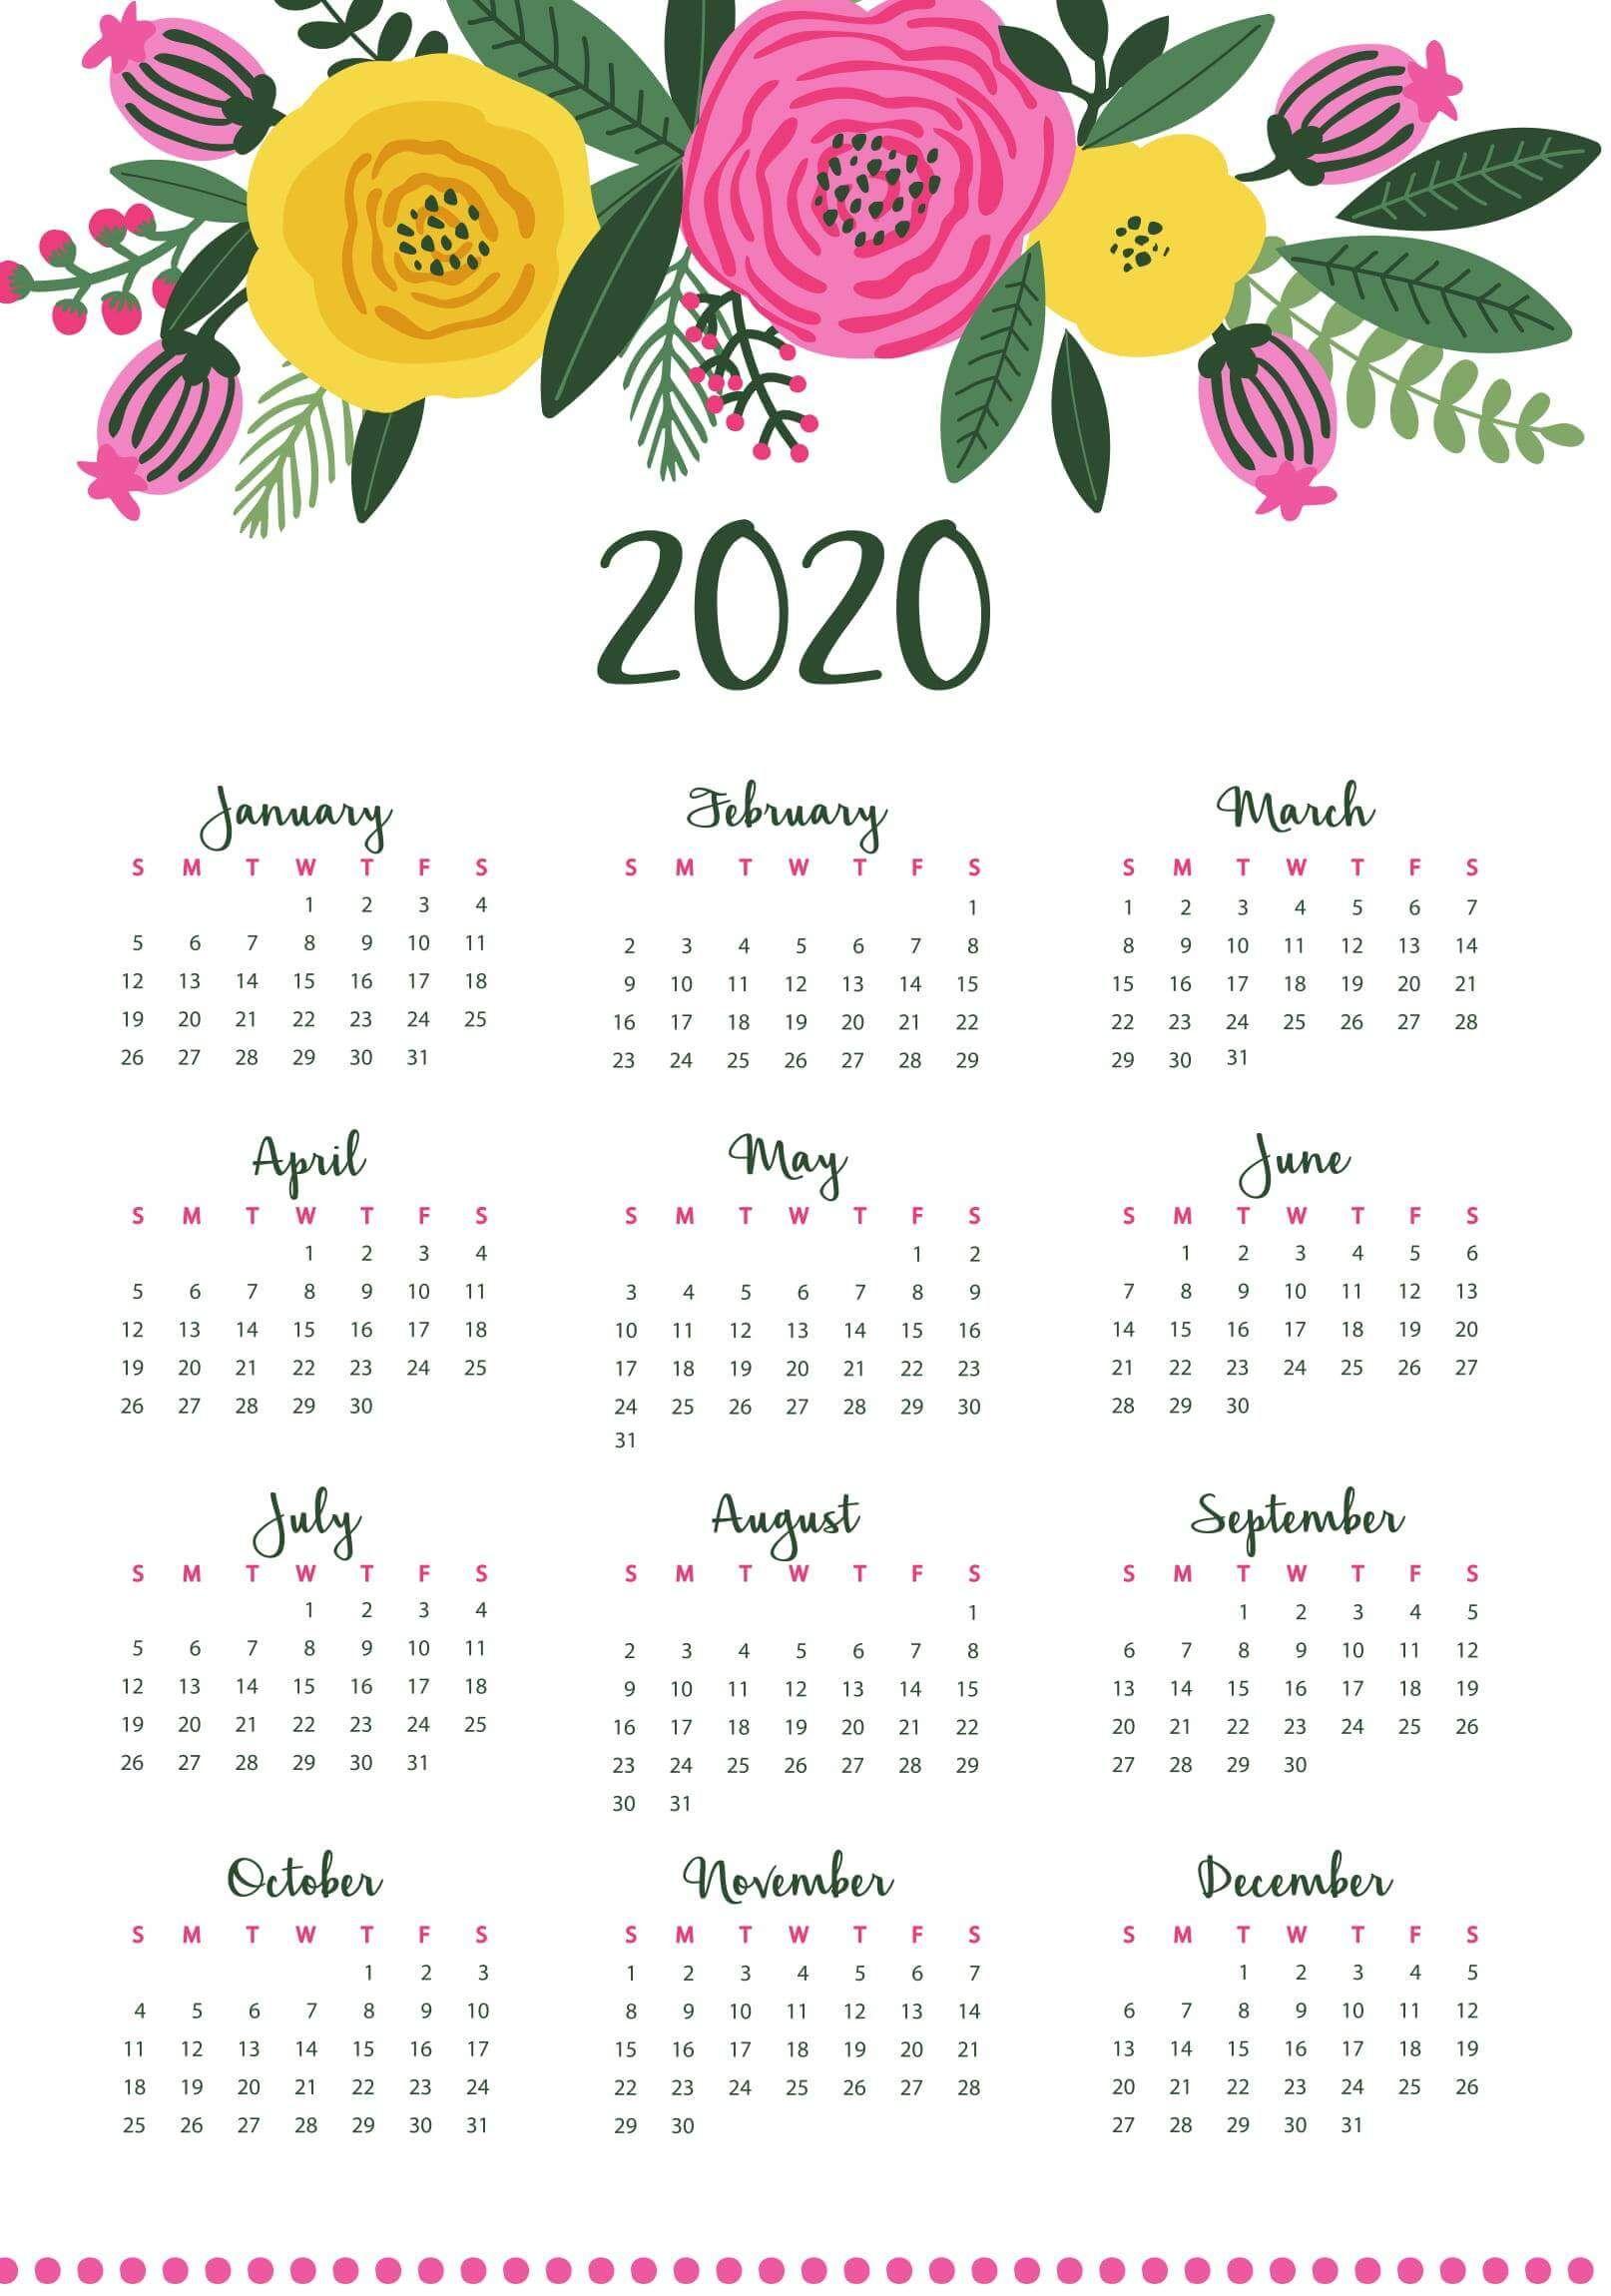 Fiscal 2020 Calendar Template Small calendar, Yearly